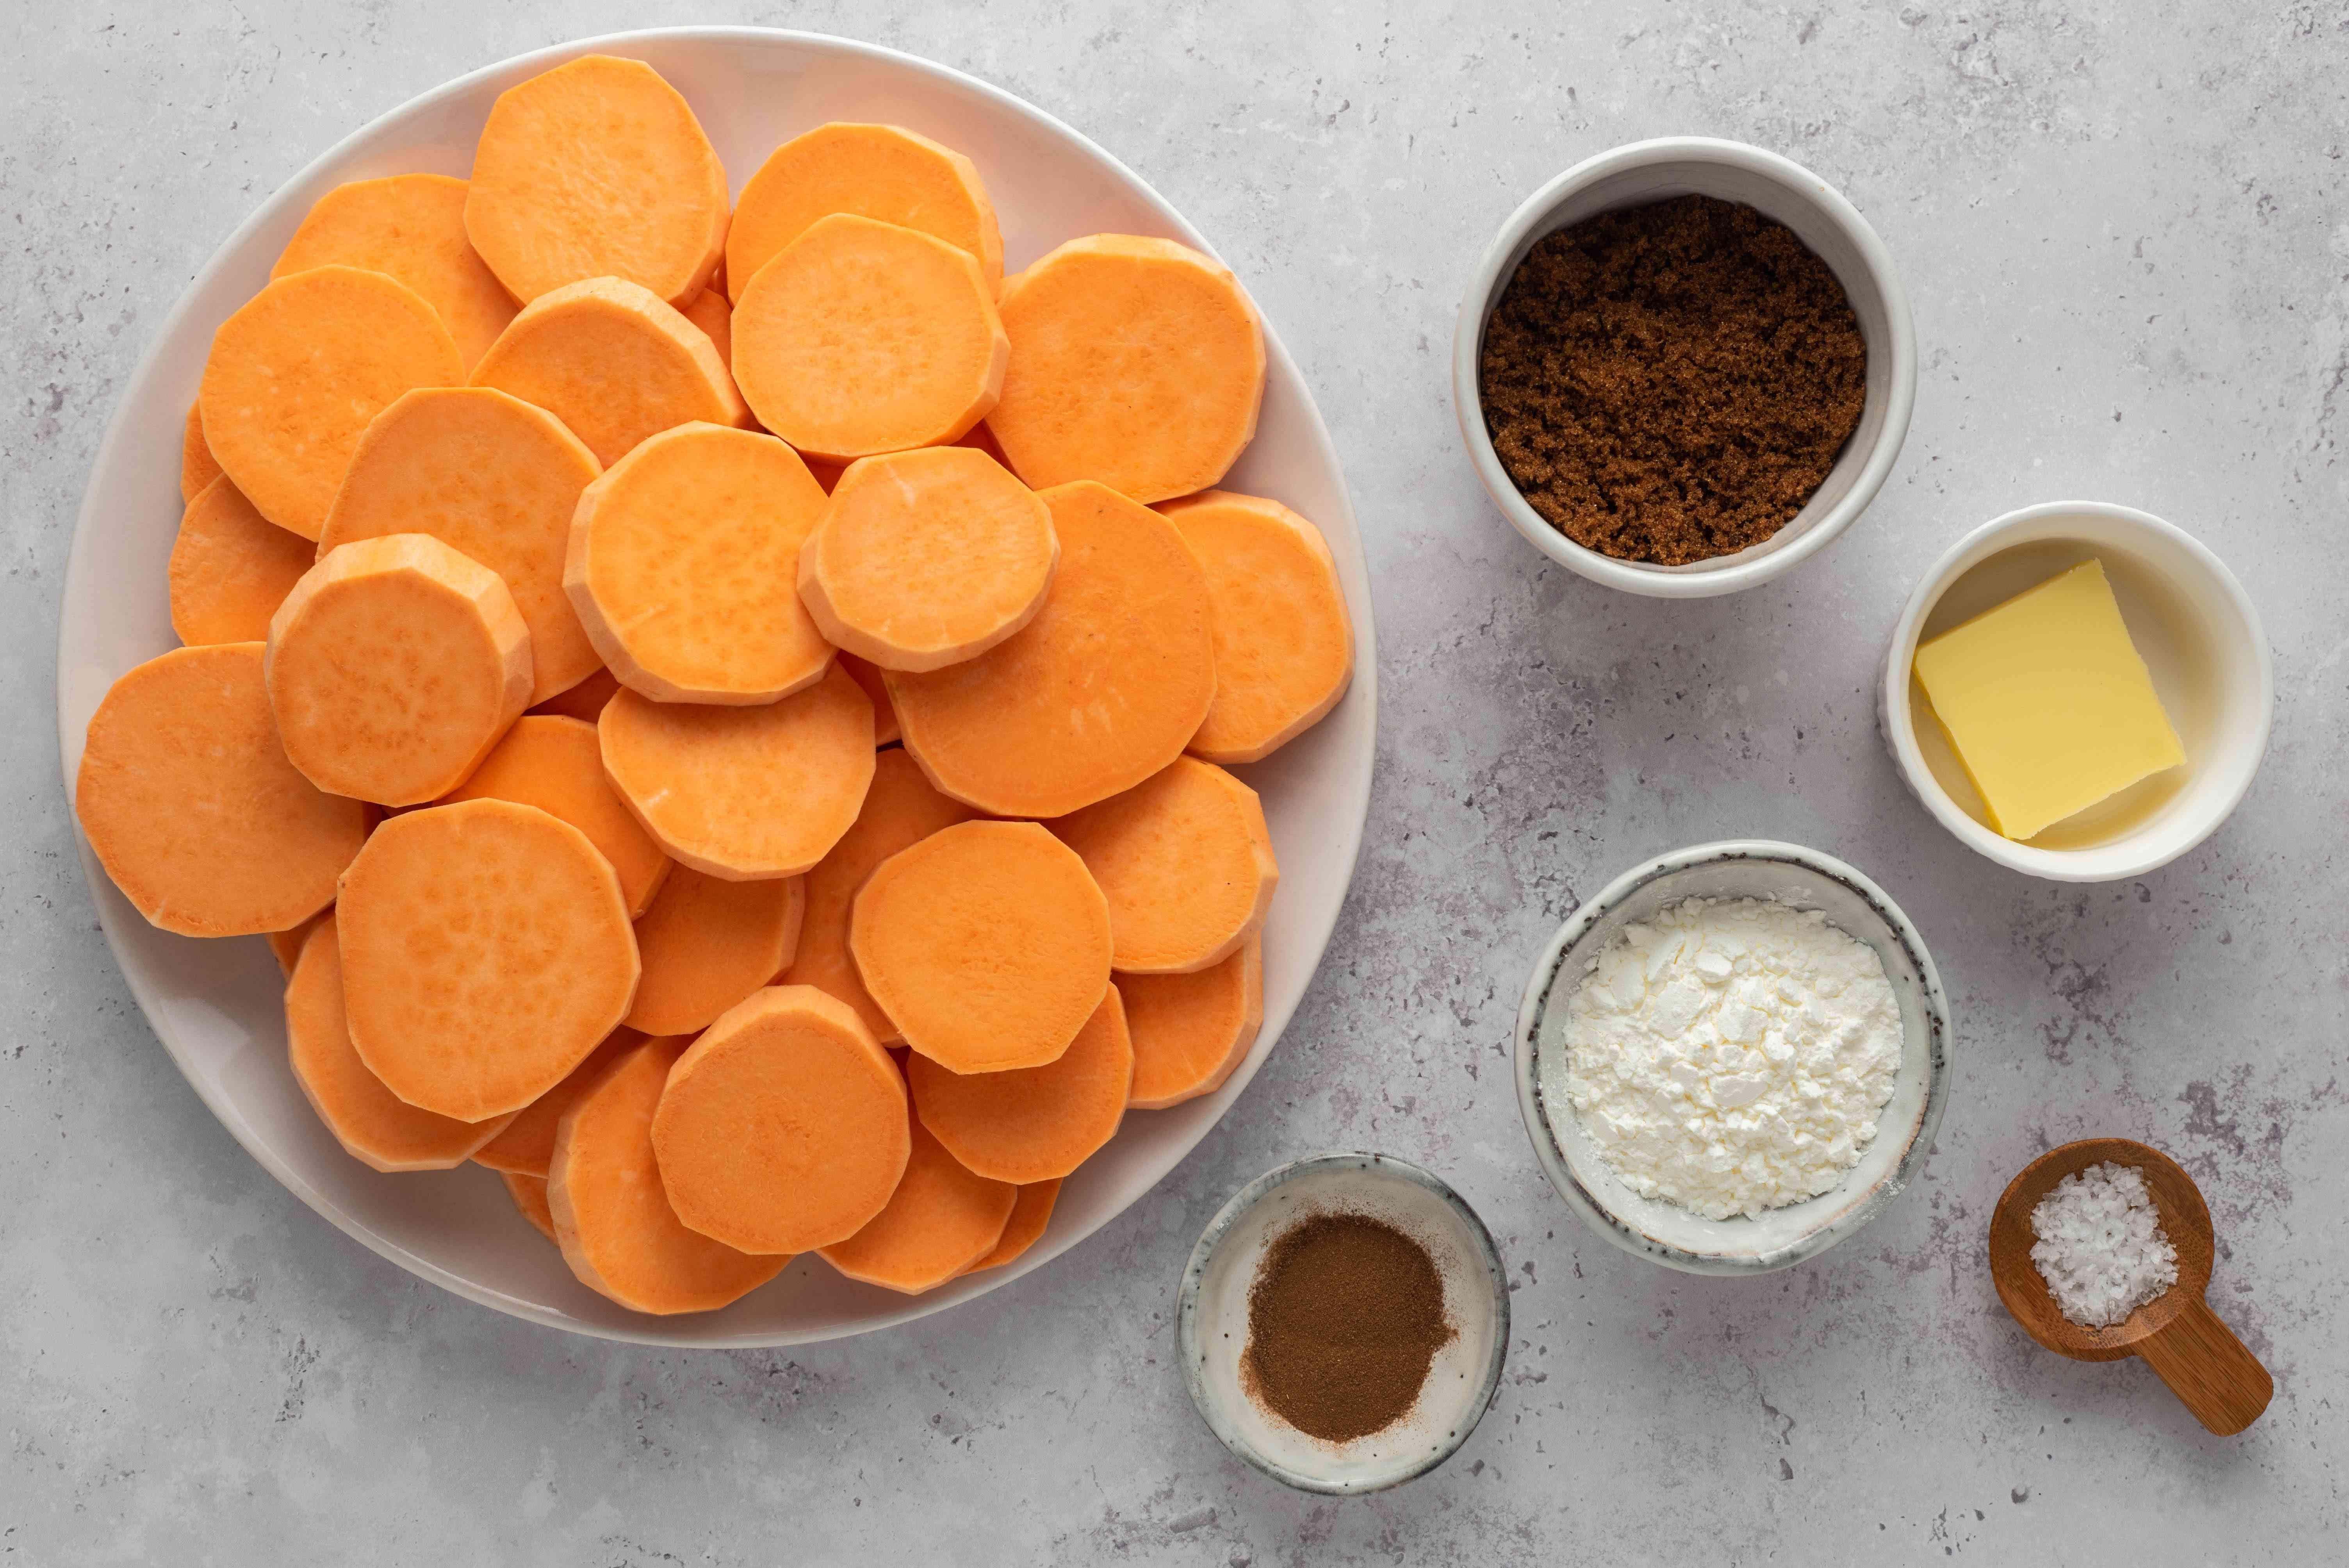 Crockpot Caramel Glazed Sweet Potatoes ingredients